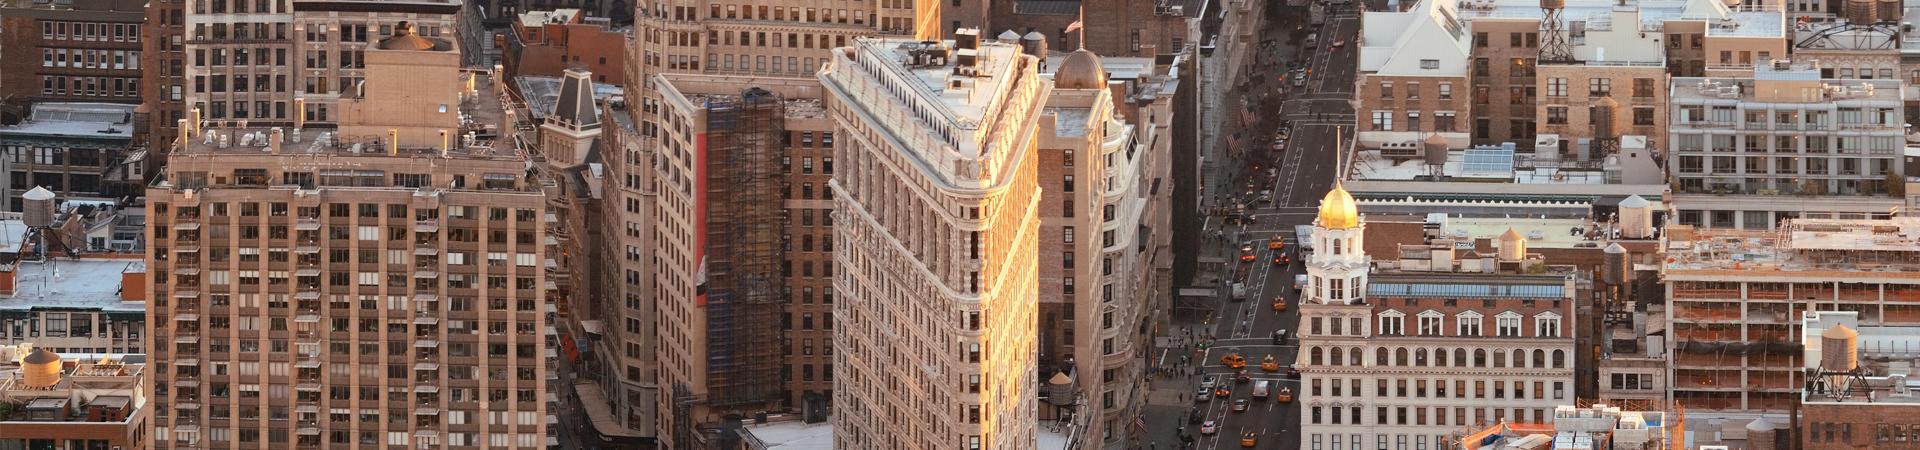 Flatiron Building 5th Avenue